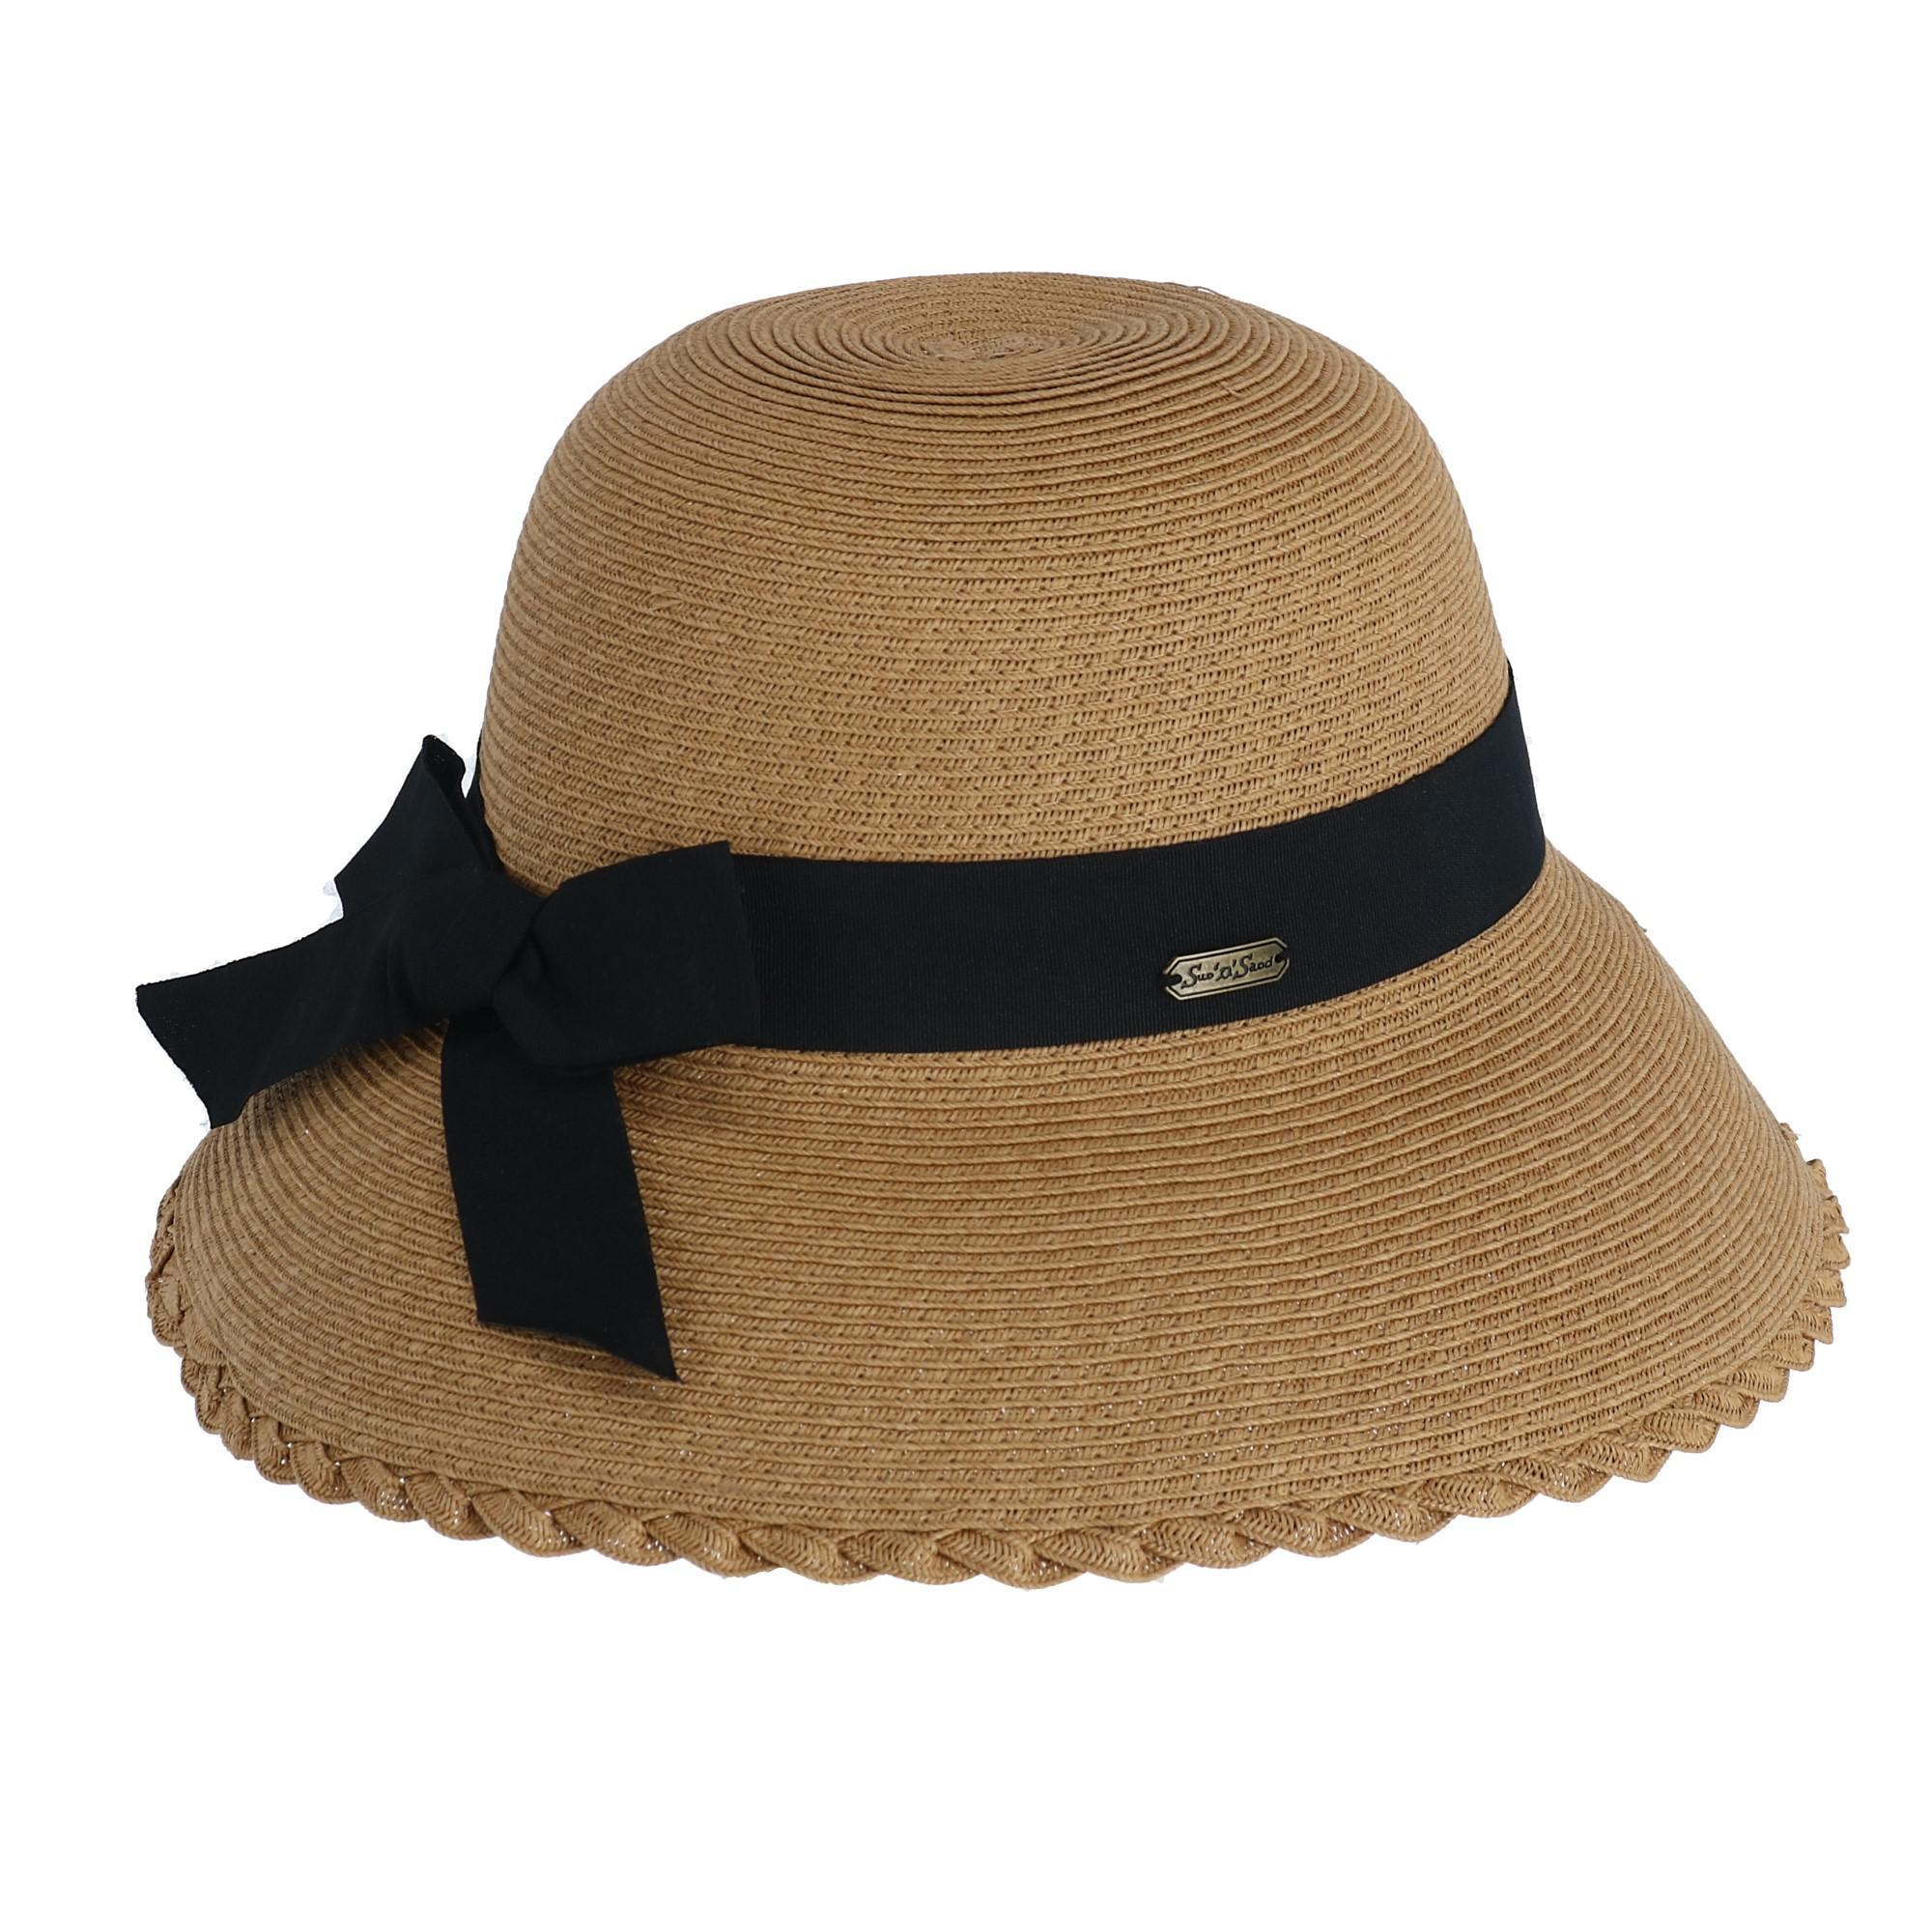 6fab18ab New Sun N Sand Women's Paper Braid Cloche with Back Bow | eBay